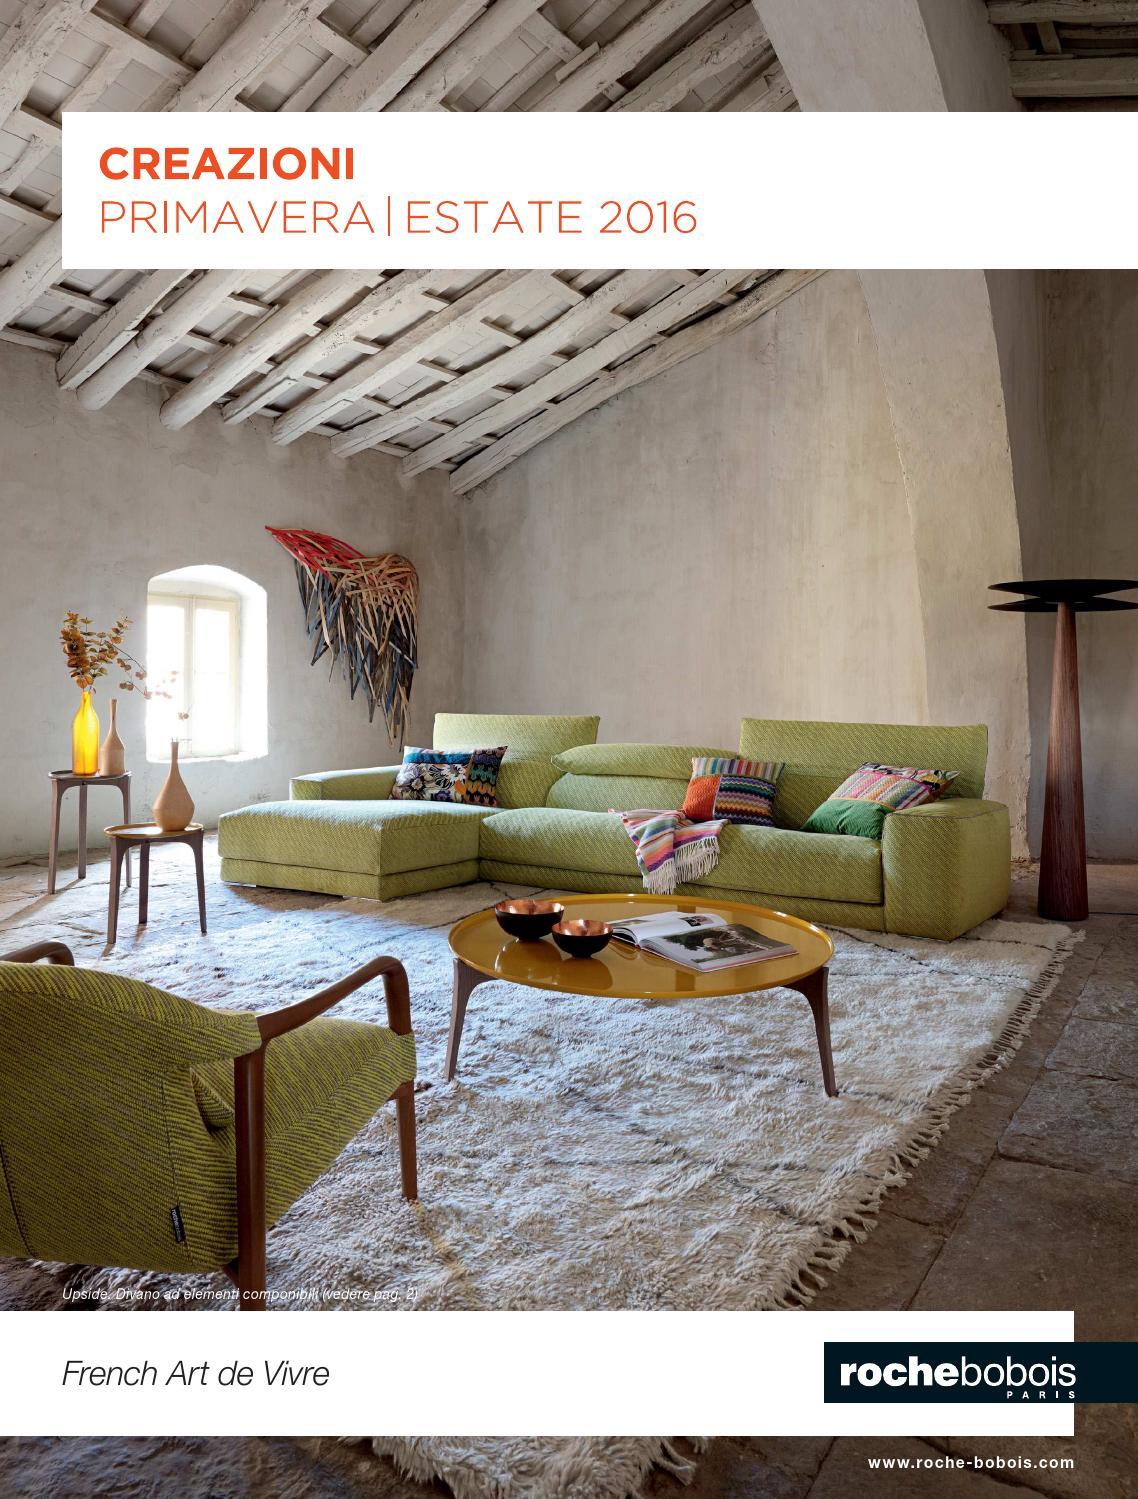 catalogue roche bobois primavera 2016 by mobilpro issuu. Black Bedroom Furniture Sets. Home Design Ideas